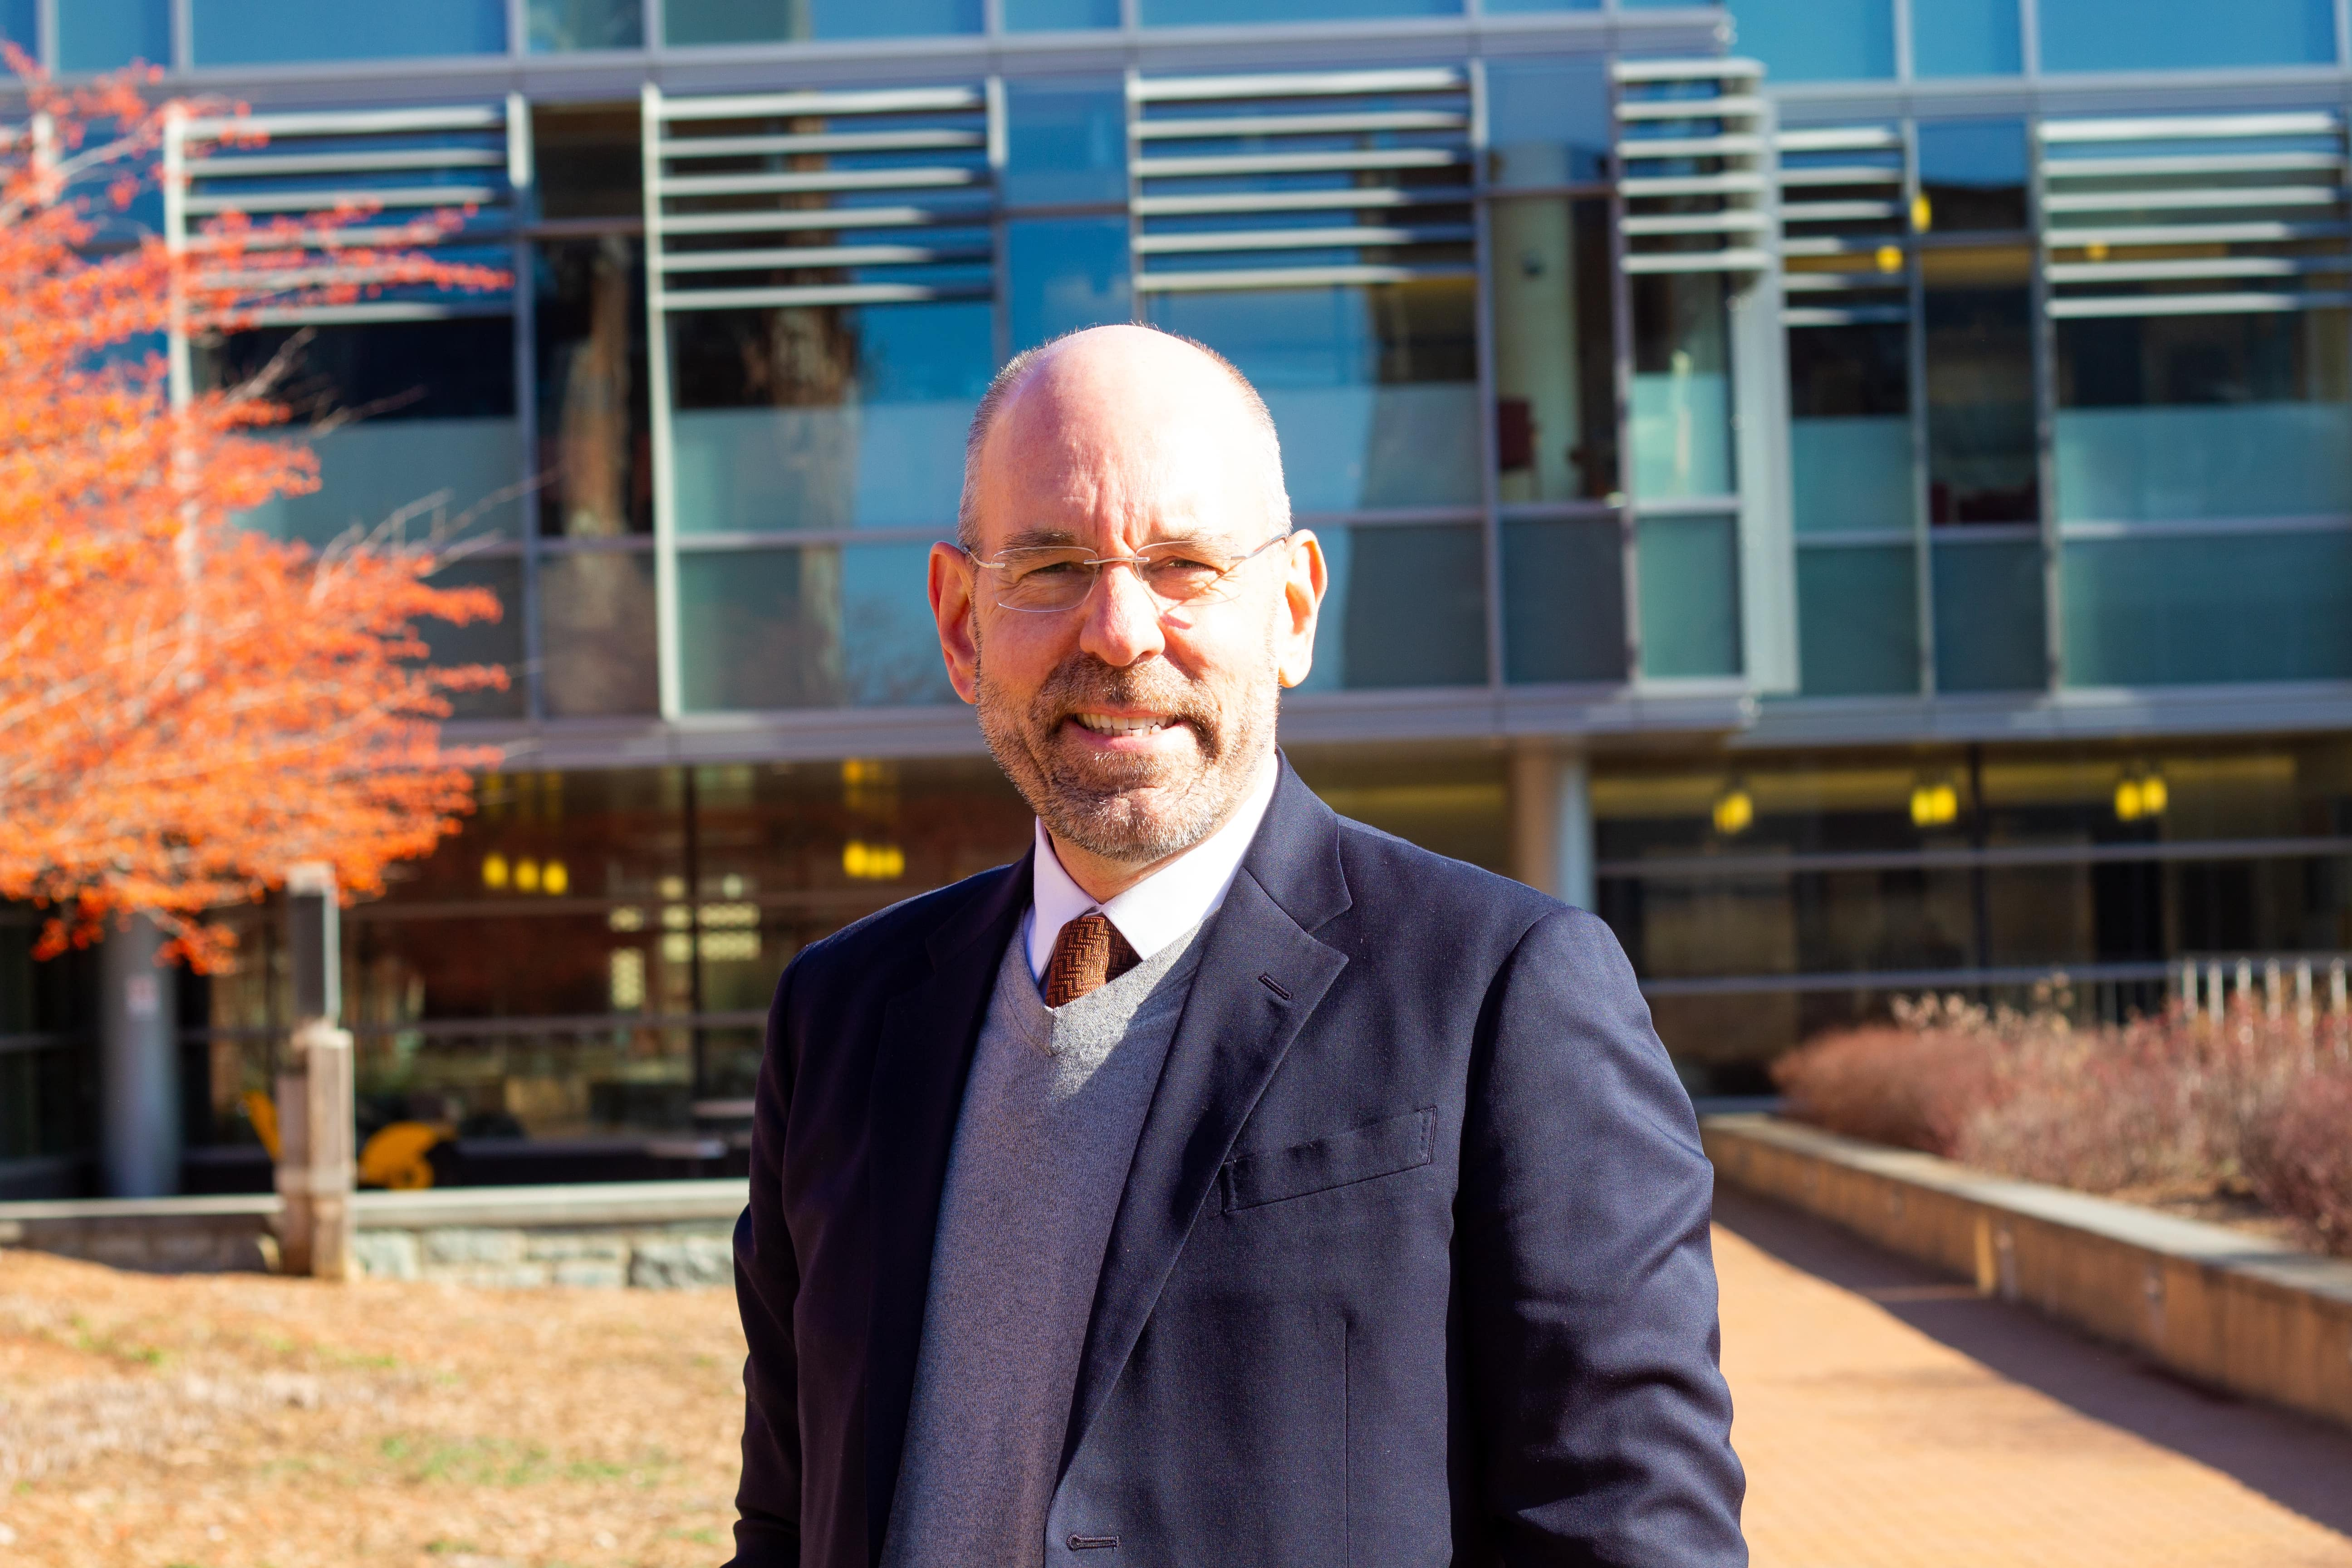 Professor Brandes stands in front of the Regents Building smiling